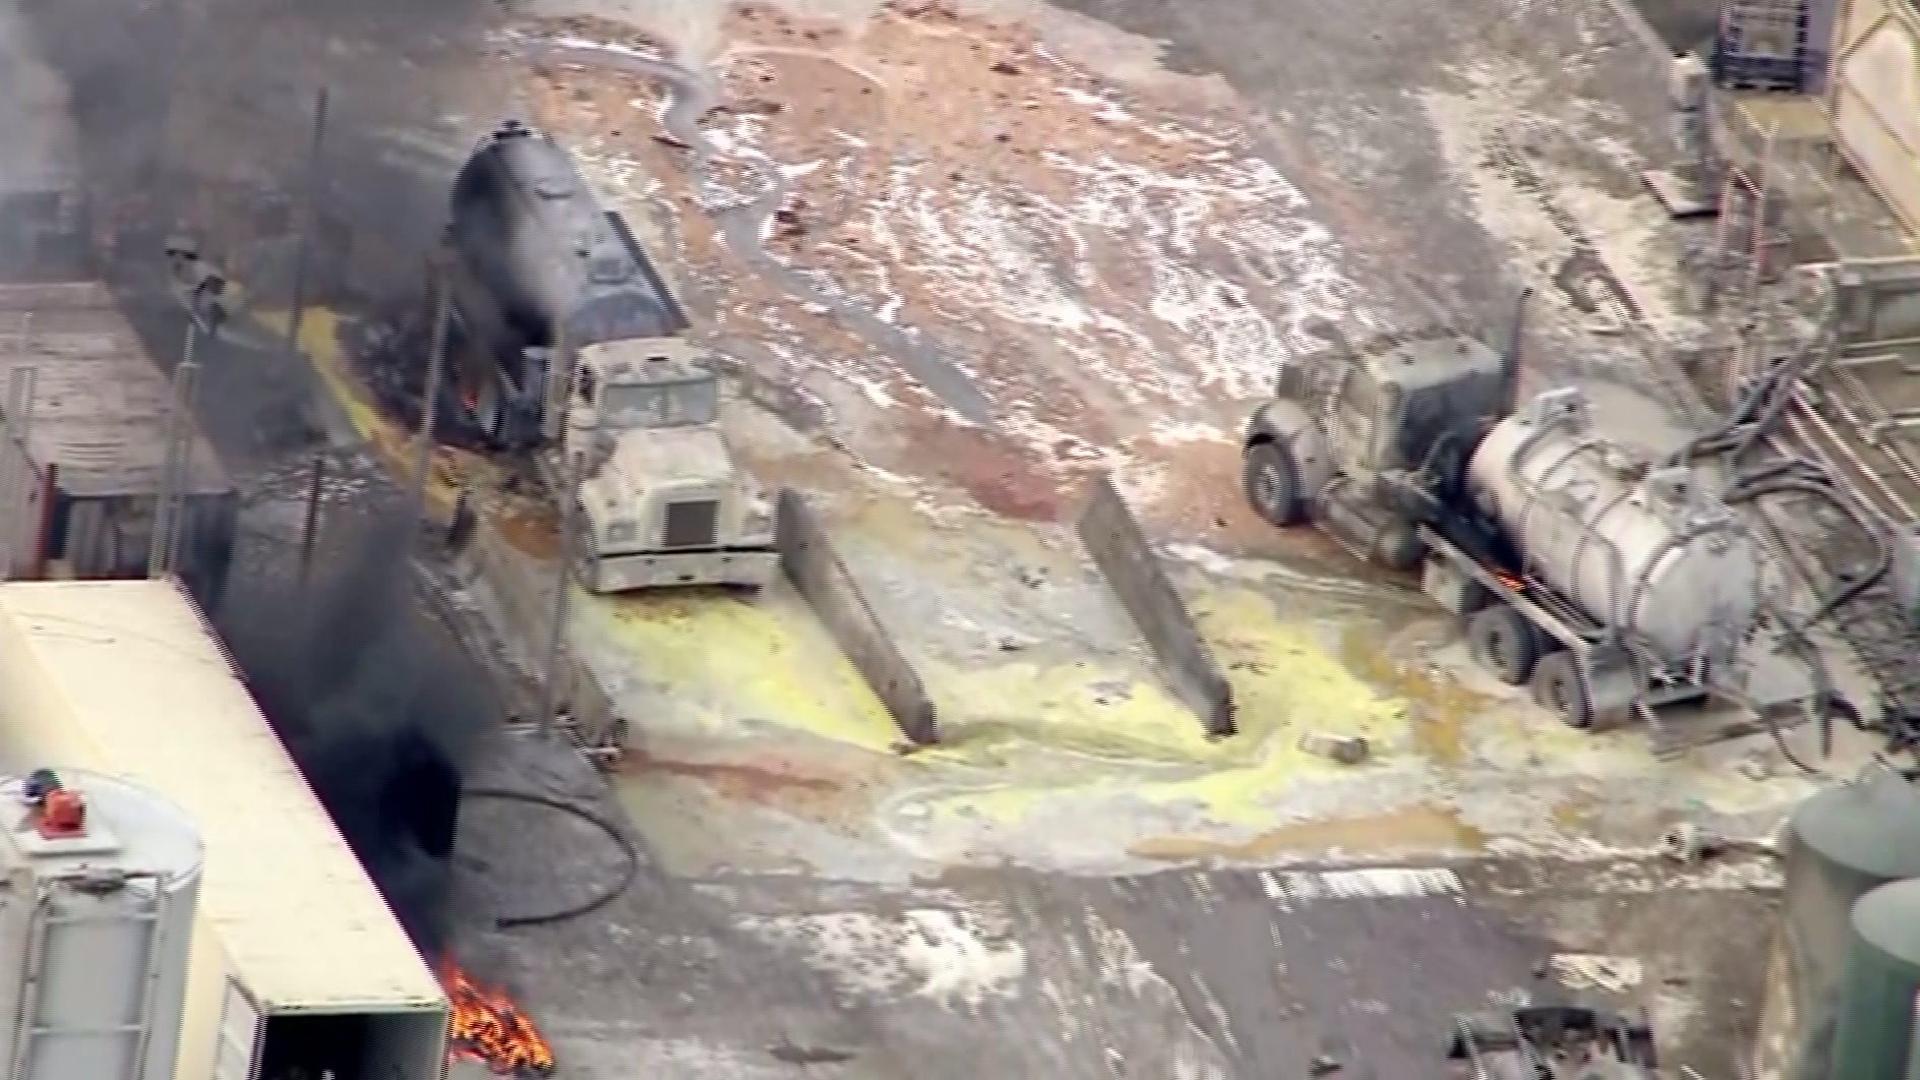 Several people were injured in an explosion at Santa Clara Waste Water Co., in Santa Paula, on Nov. 18, 2014. (Credit: KTLA)